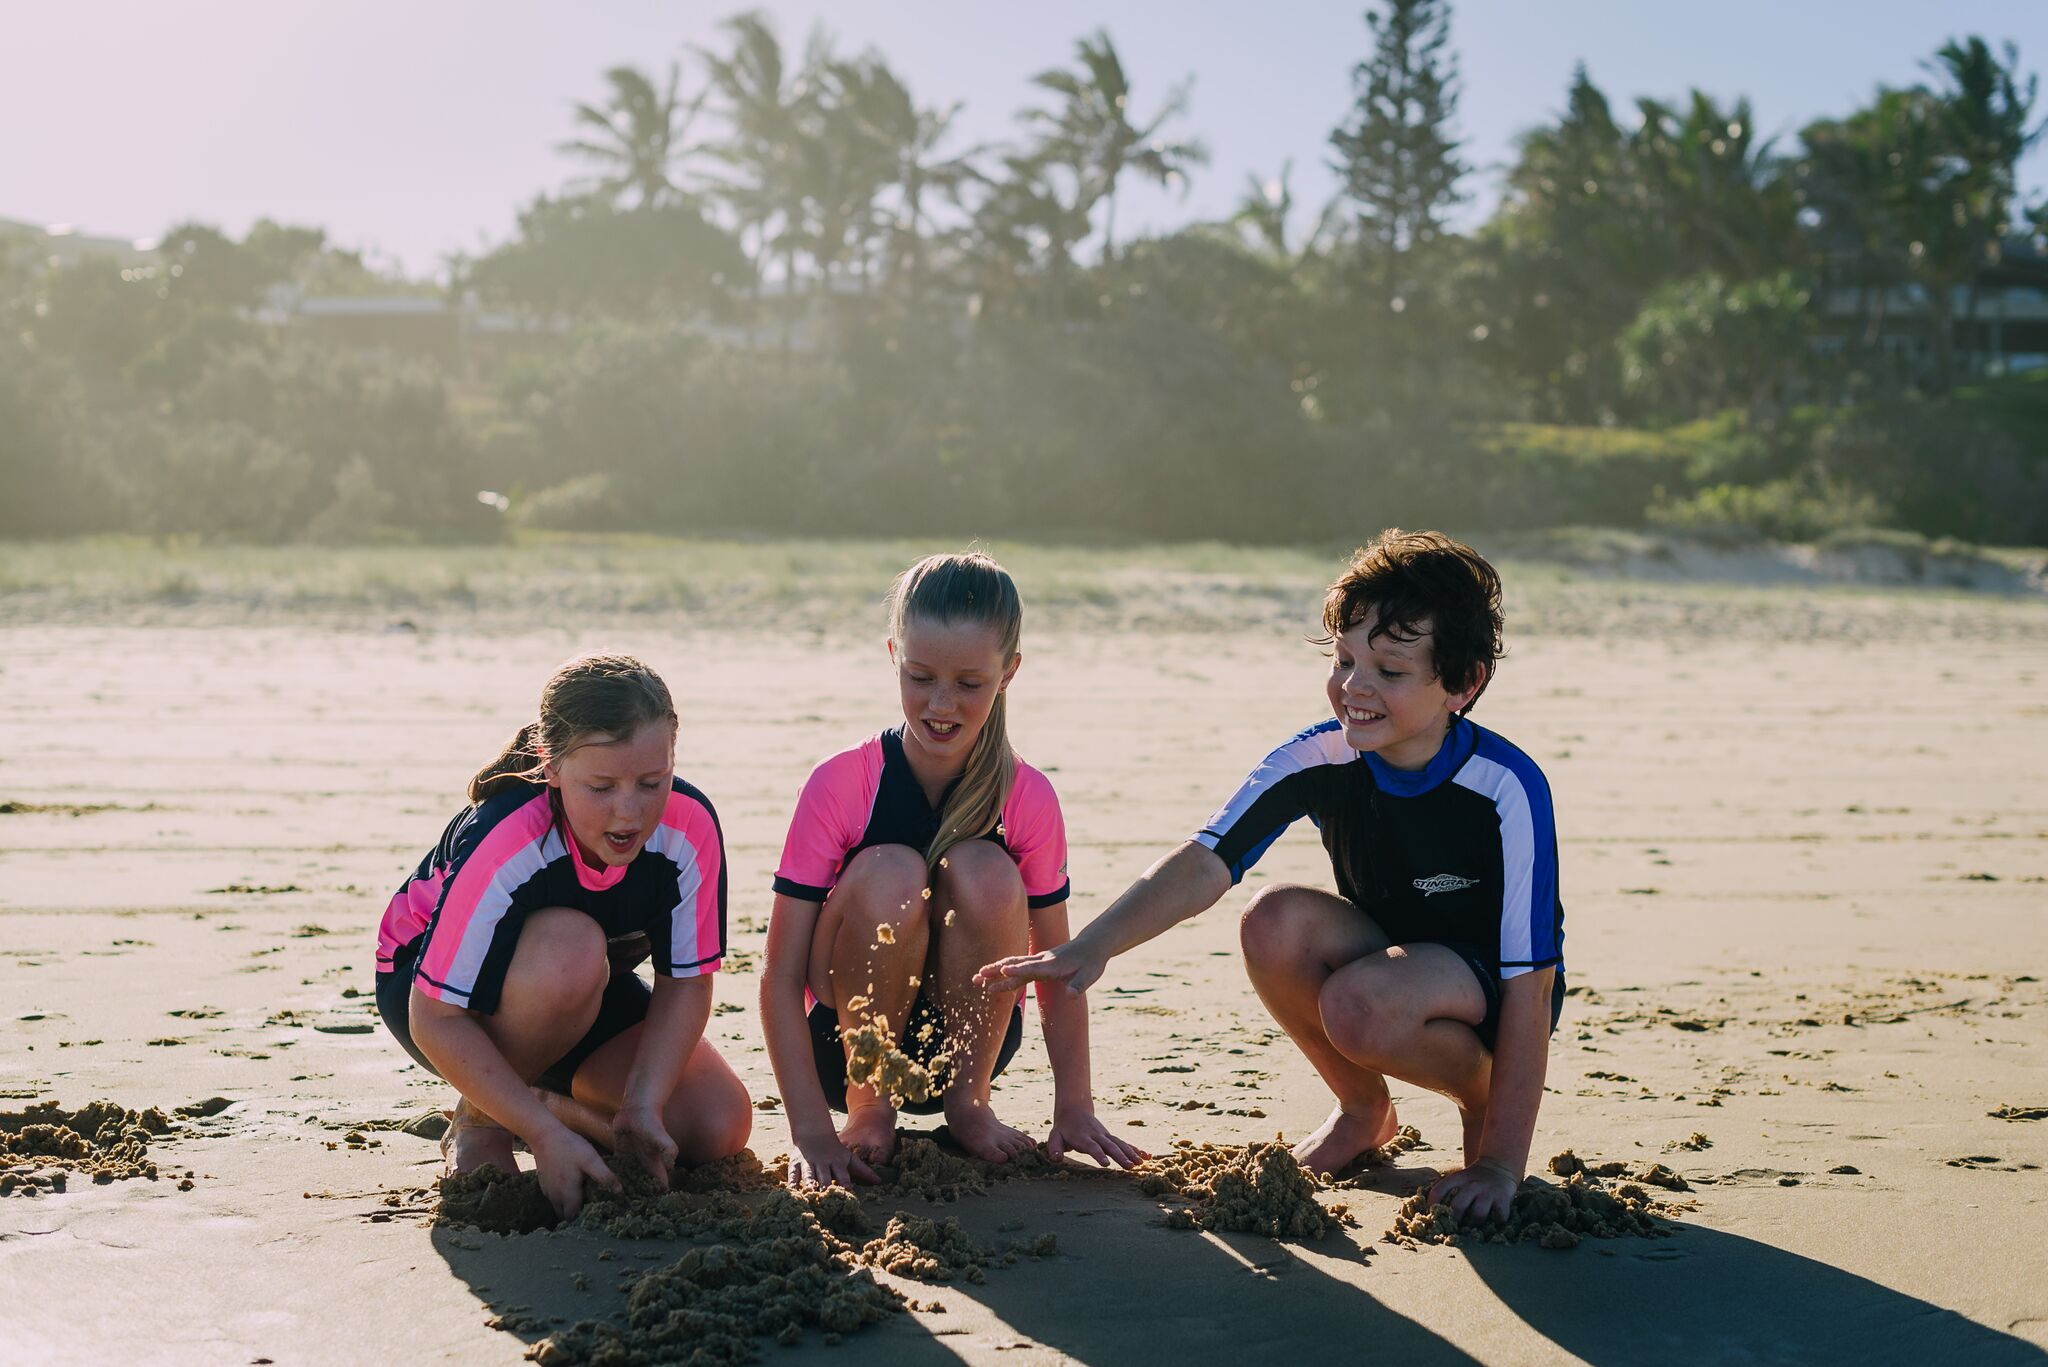 137-stingray-sunshine-beach-noosa-beachwear-preview.jpeg